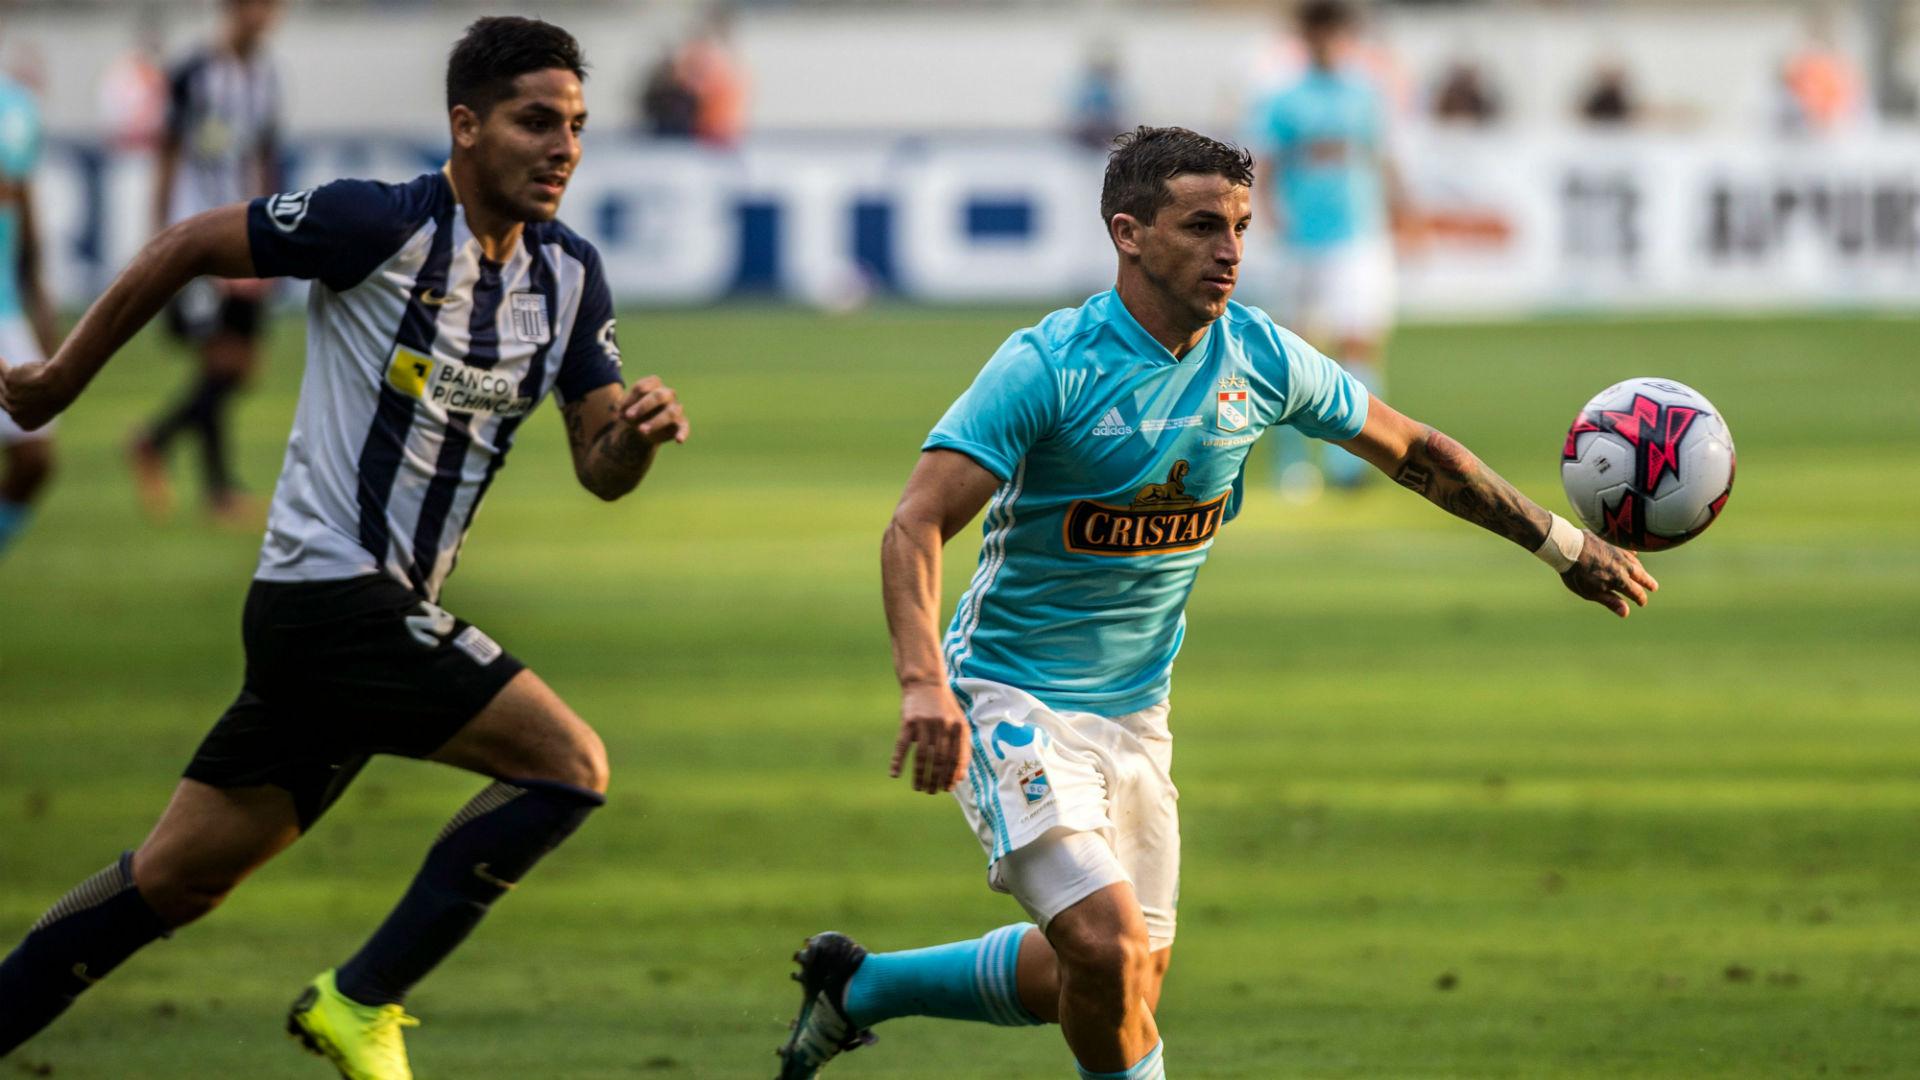 161218 Alianza Lima Sporting Cristal Gabriel Costa Francisco Duclos